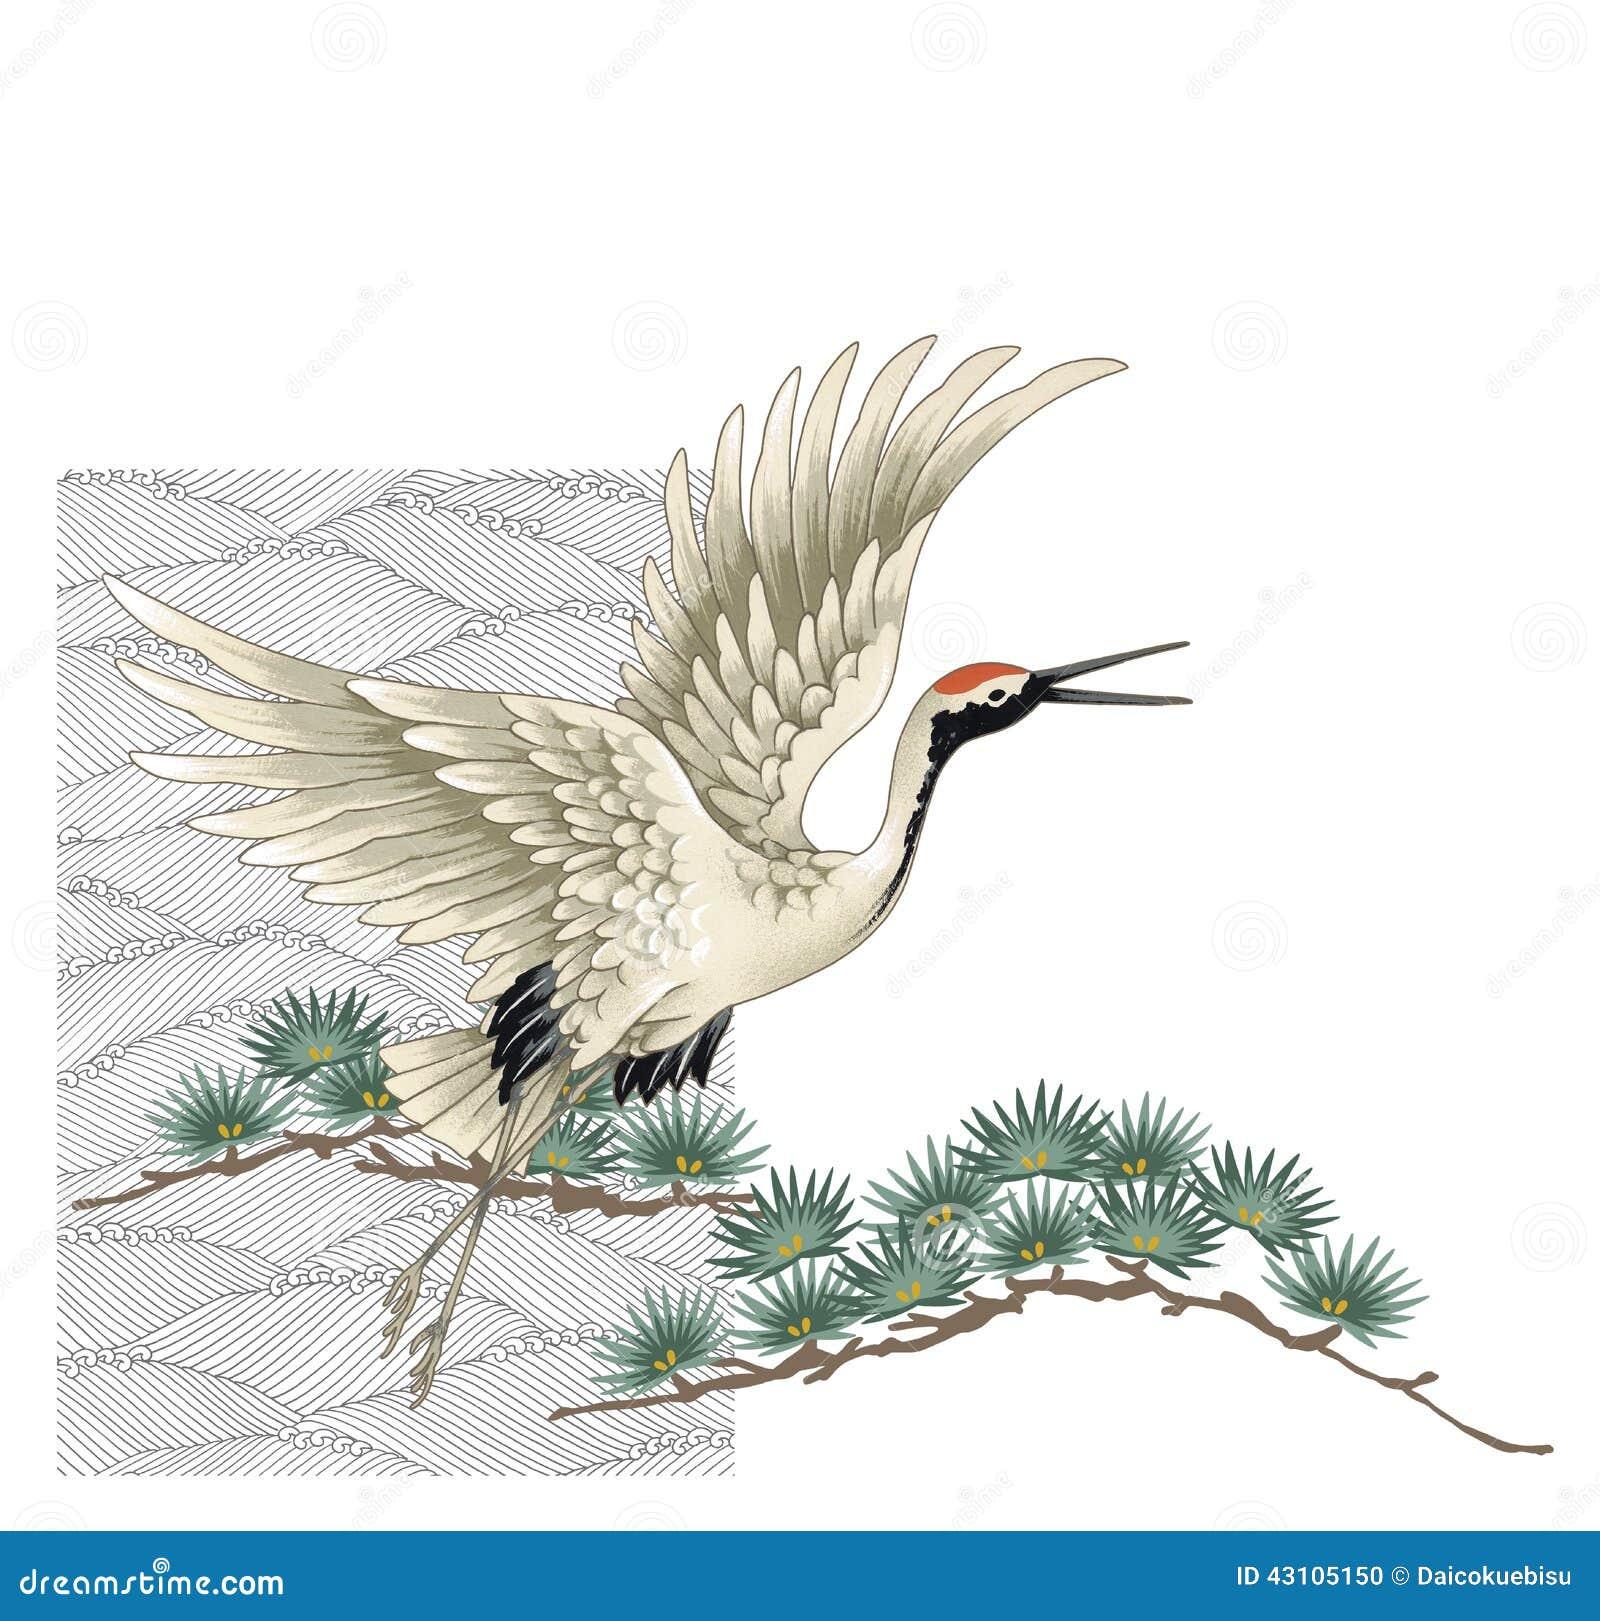 Japanese crane stock illustration. Illustration of birds ... - photo#15